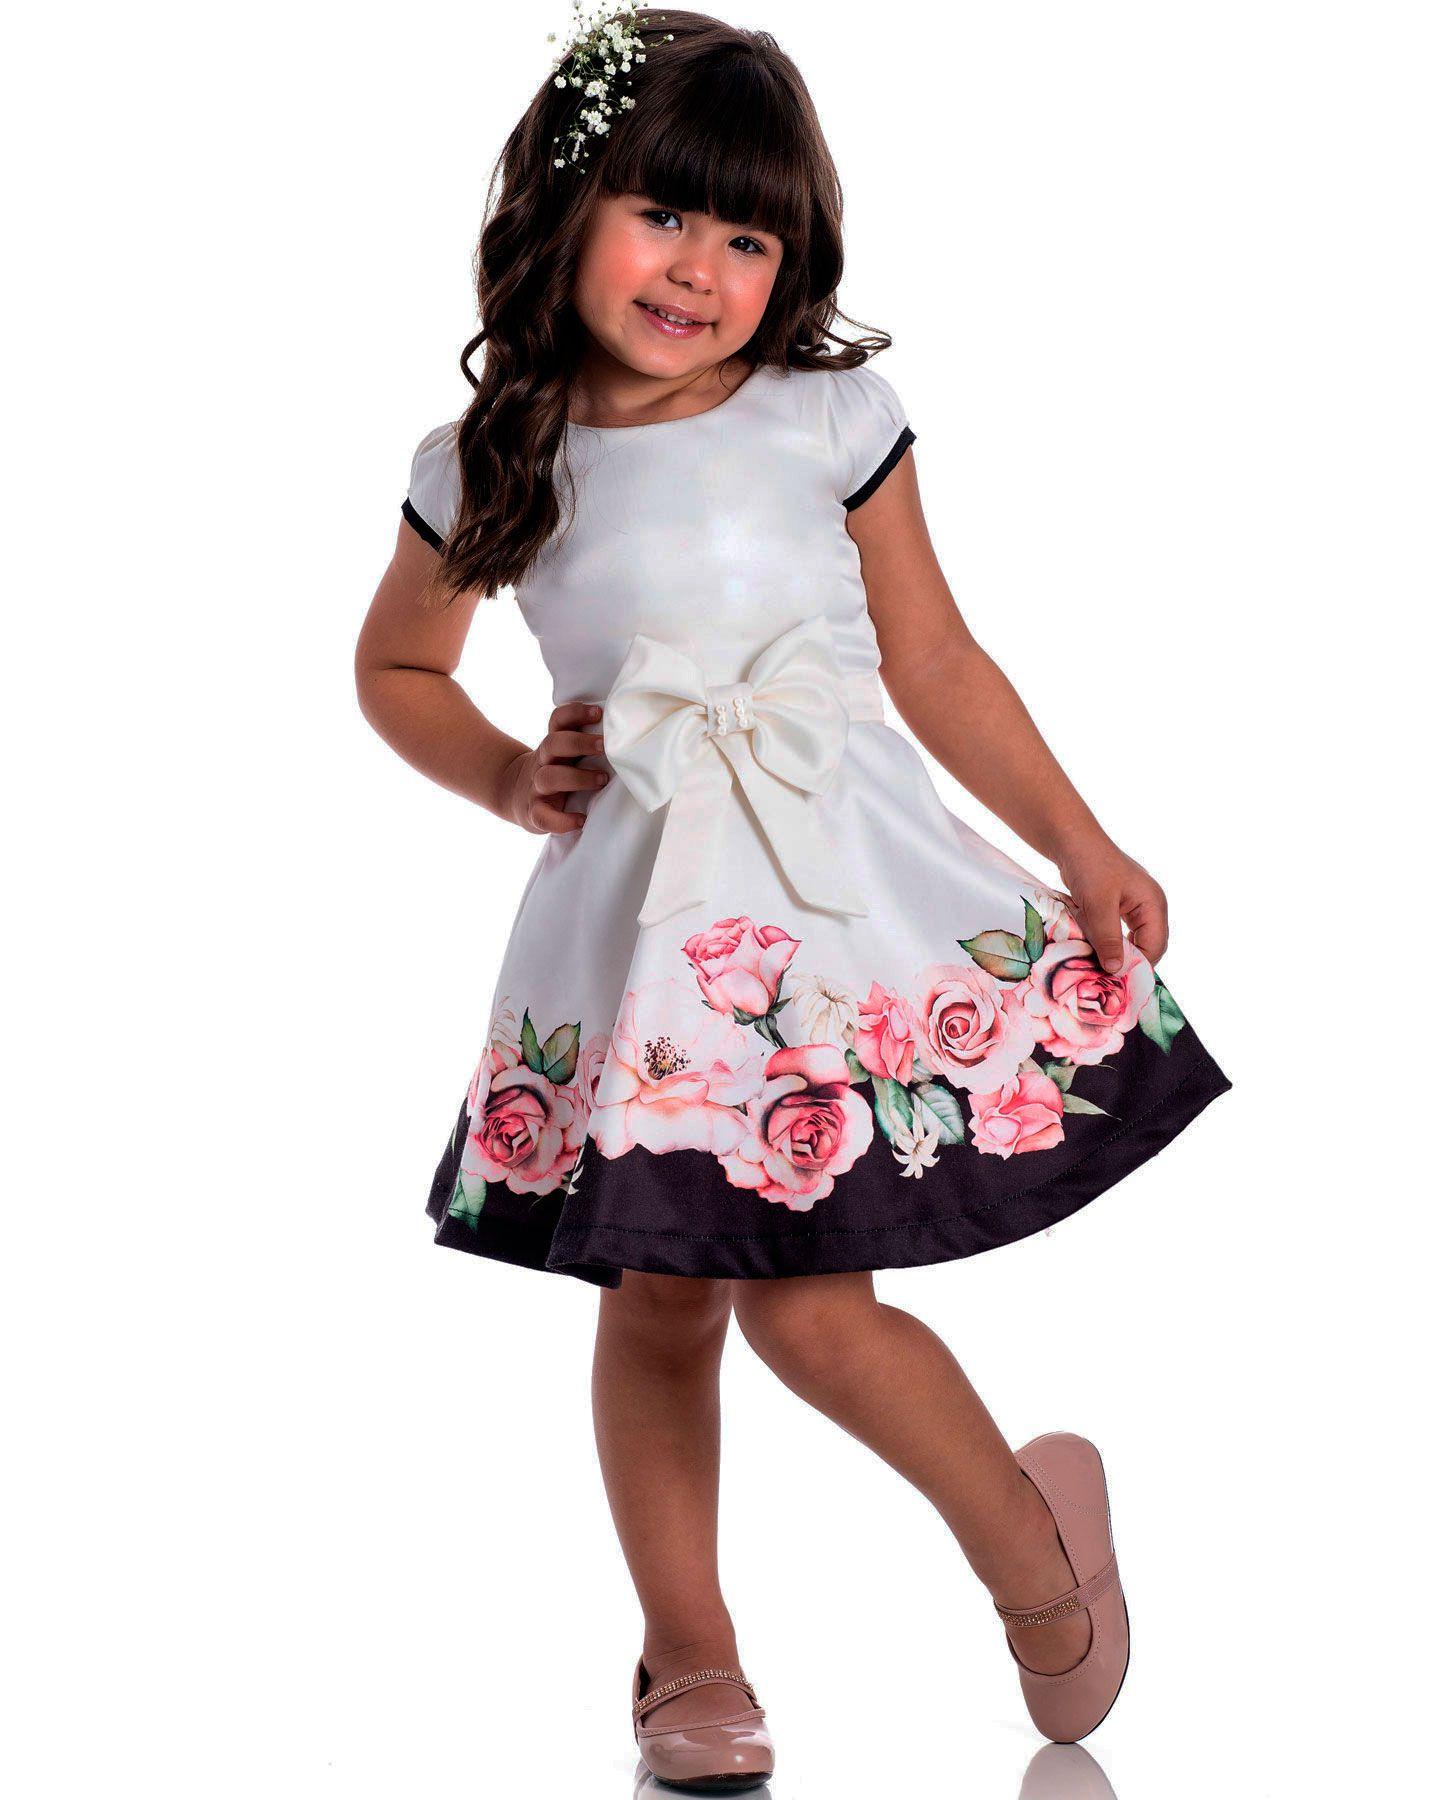 Vestido Festa Infantil Serelepe Listras